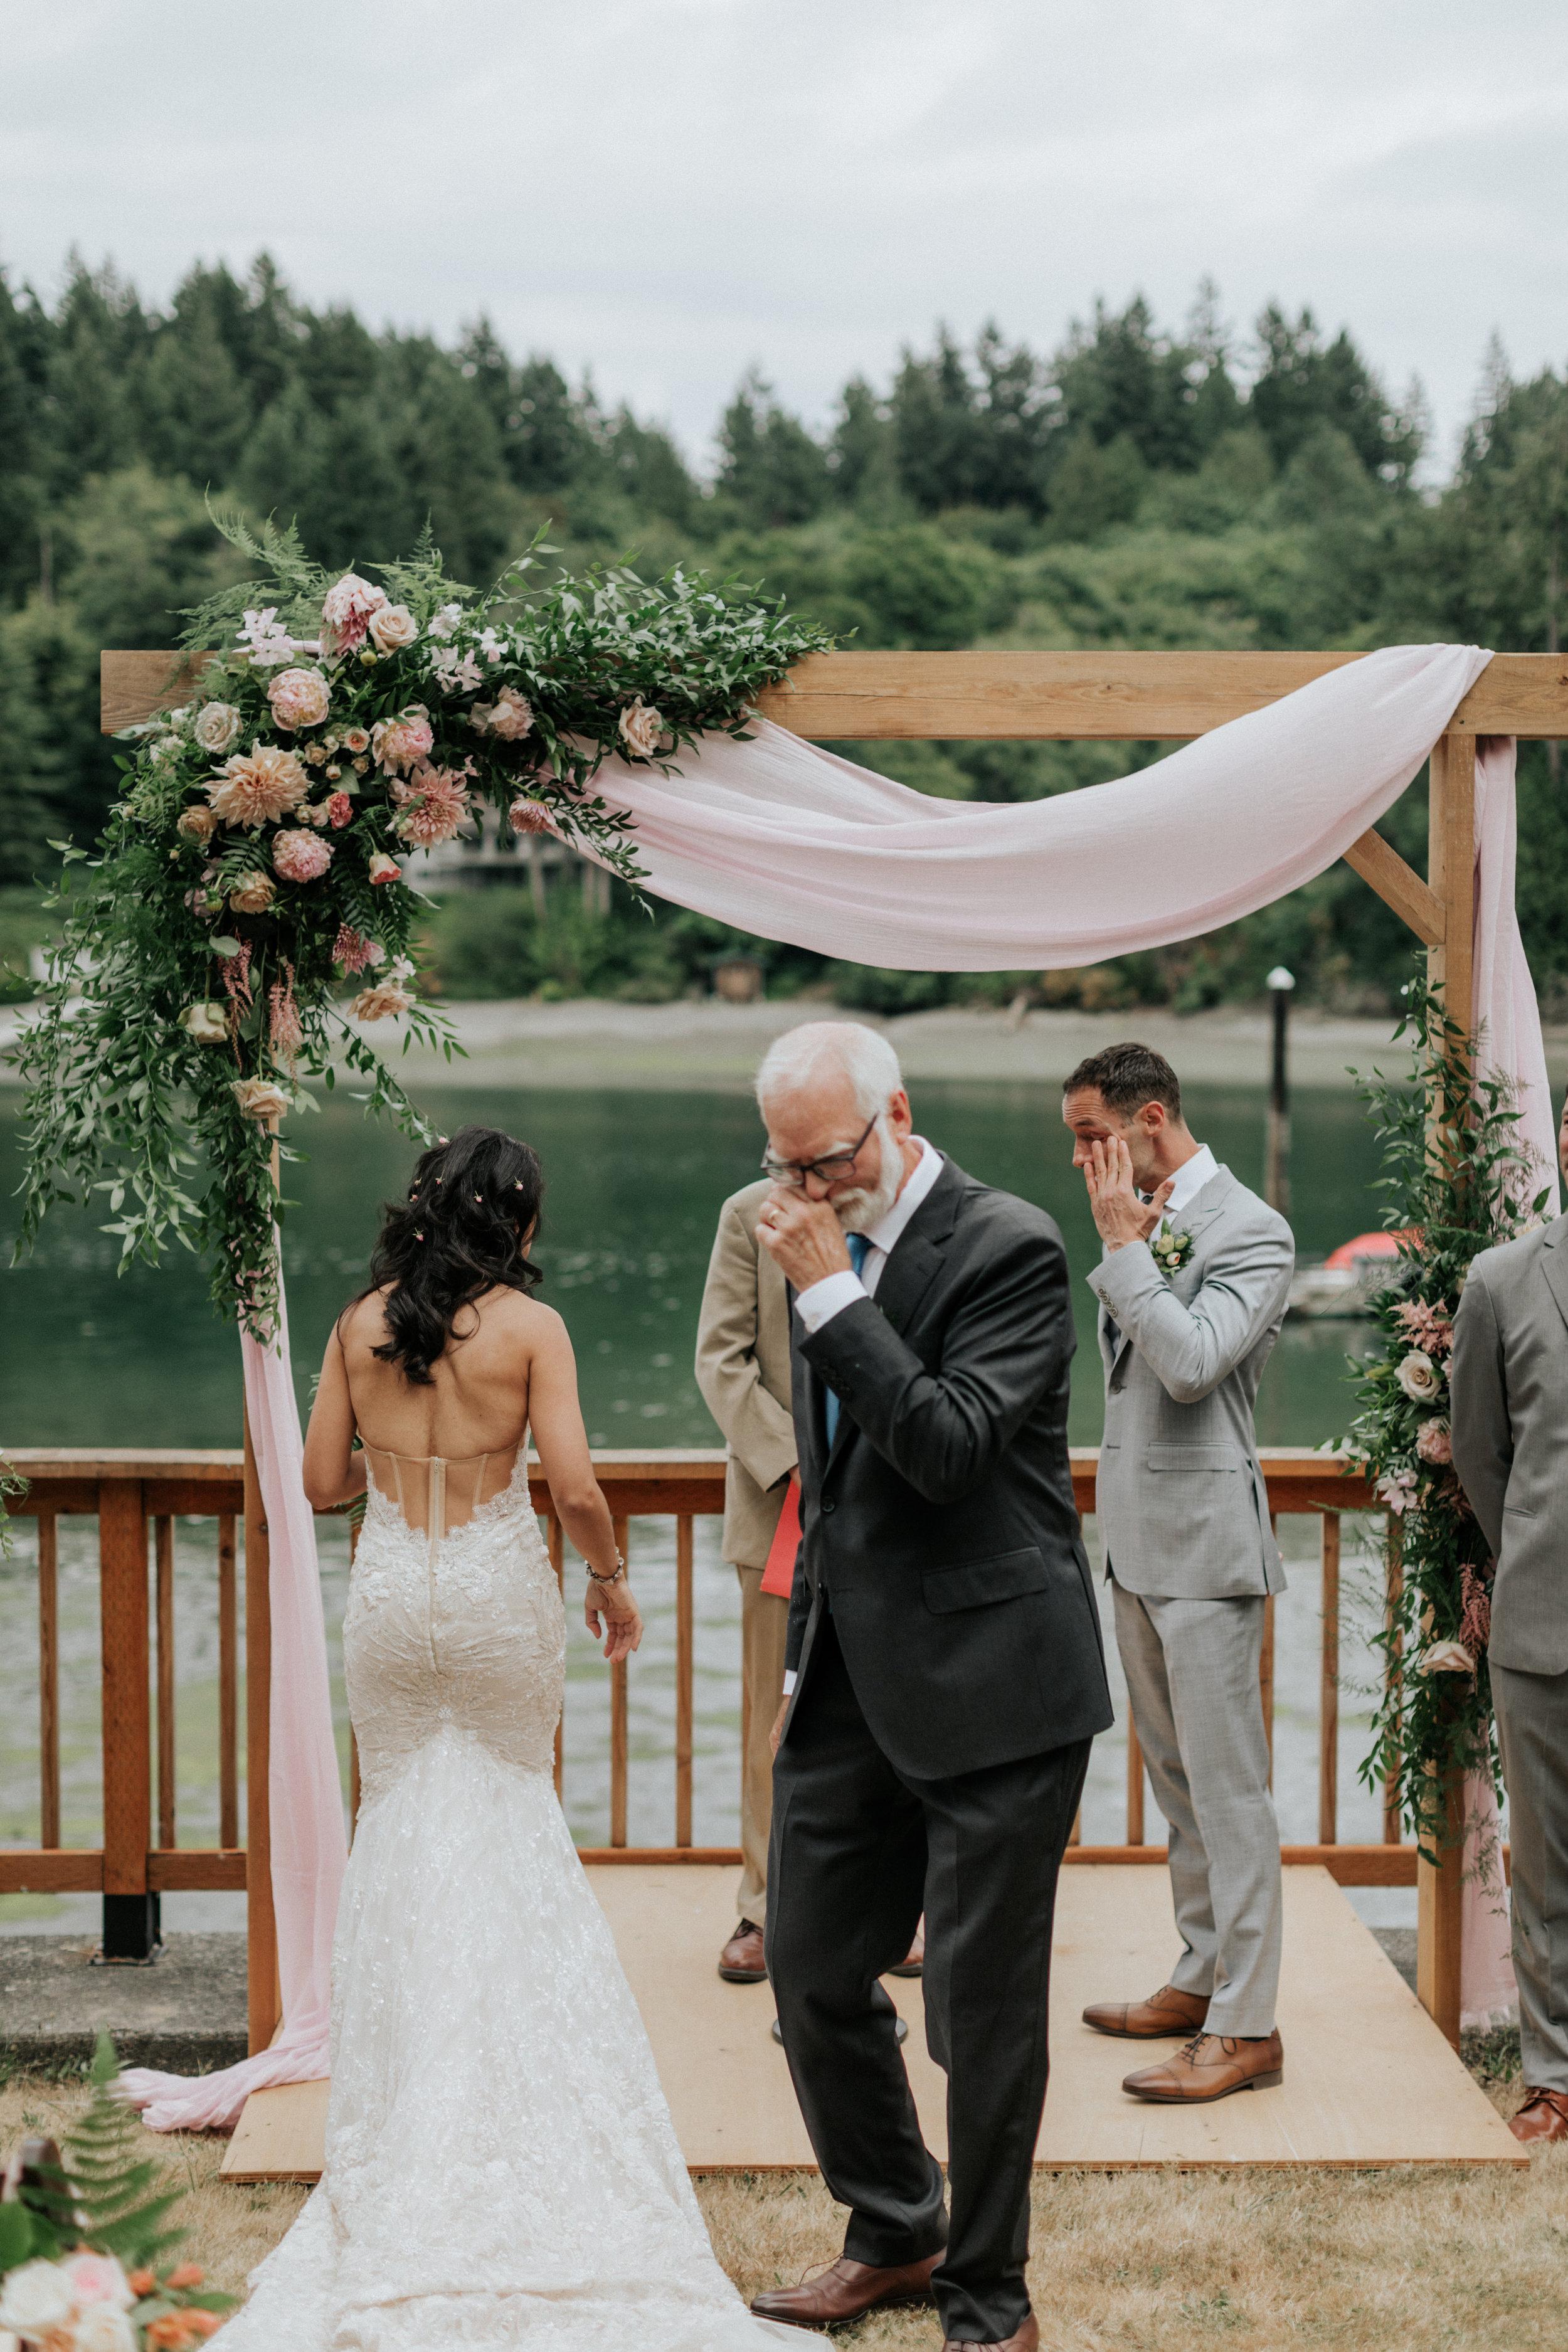 EmilyKeeneyPhotography_Sara+Ryan_7.2019-460.jpg